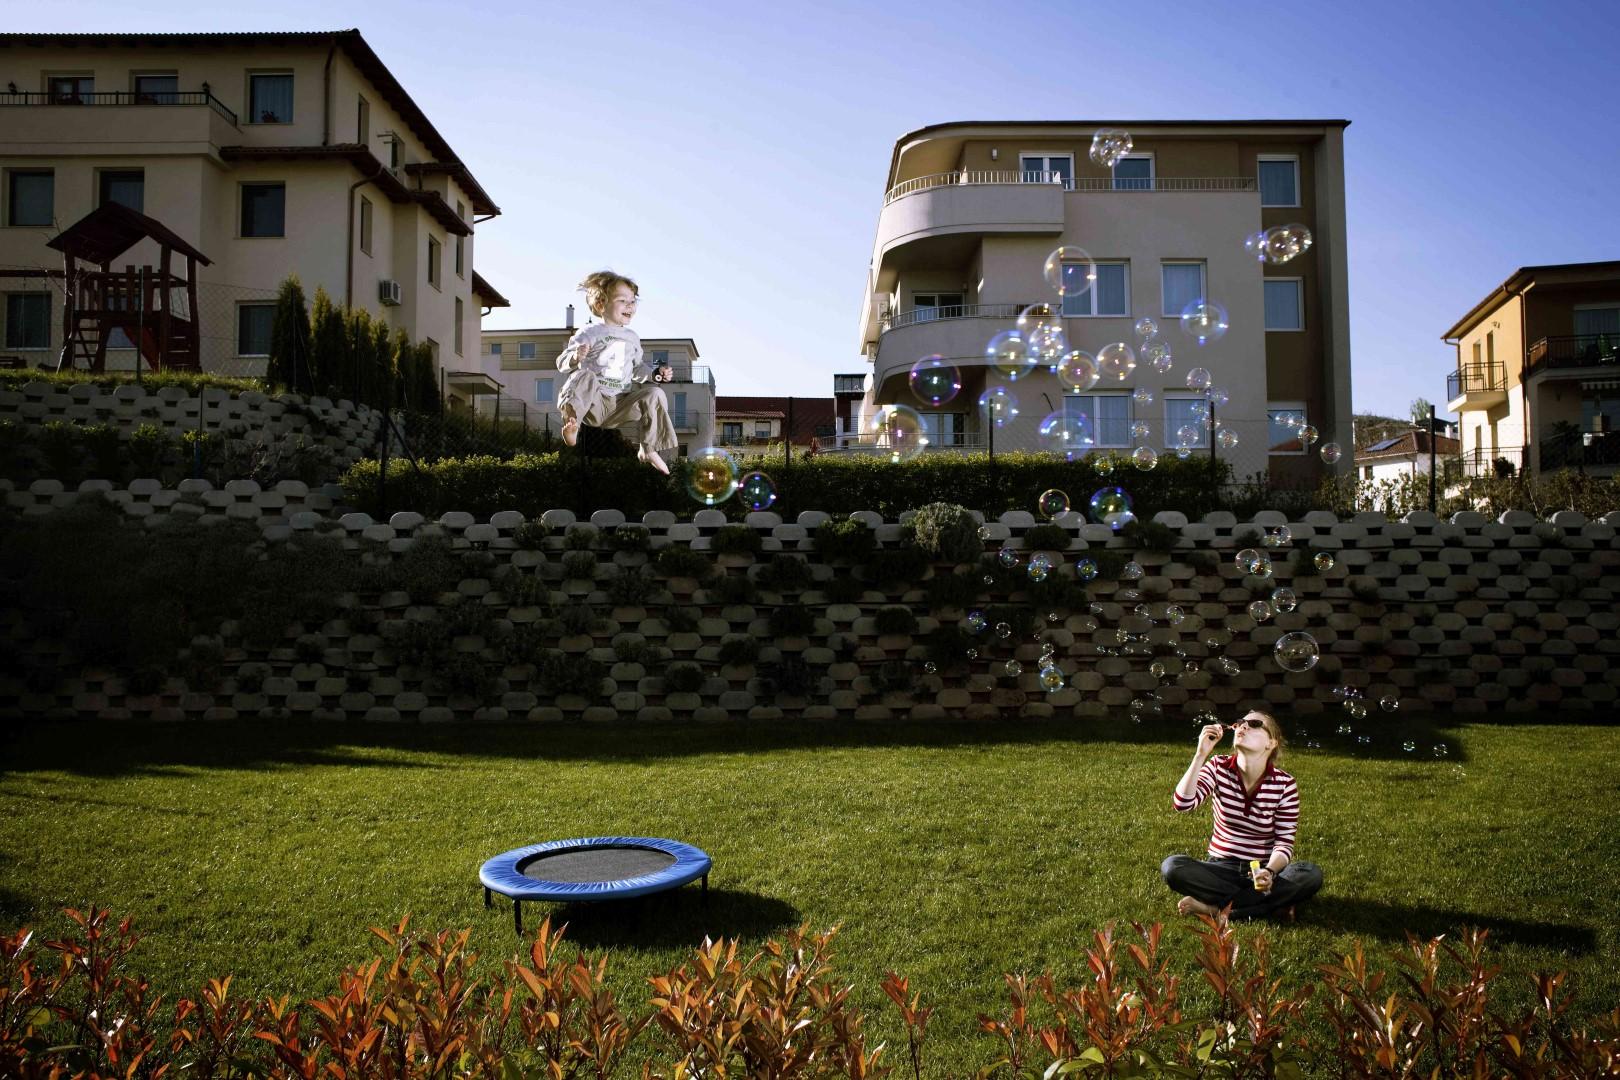 Fotó: Sopronyi Gyula, Gurabi Orsolya - GYES-en lévő anyuka kisfiával Simonnal (Lakóparkok sorozat) I Orsolya Gurabi on maternity leave with her son Simon (Residential Parks series), 2010-2011